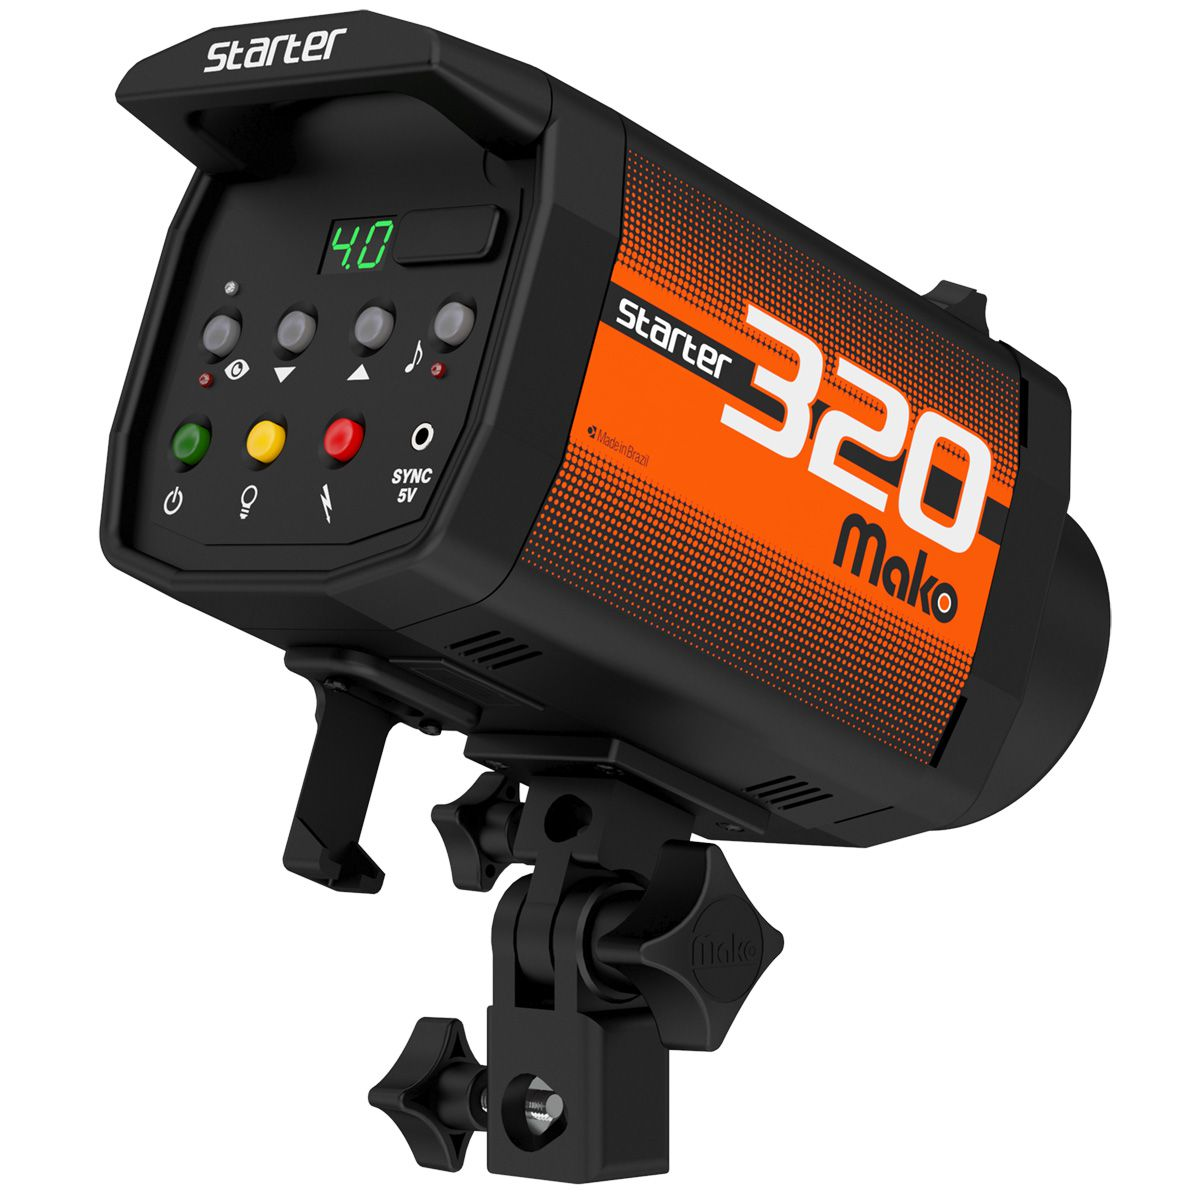 Studio STARTER 220 | COMBO 2 | Digital Bivolt